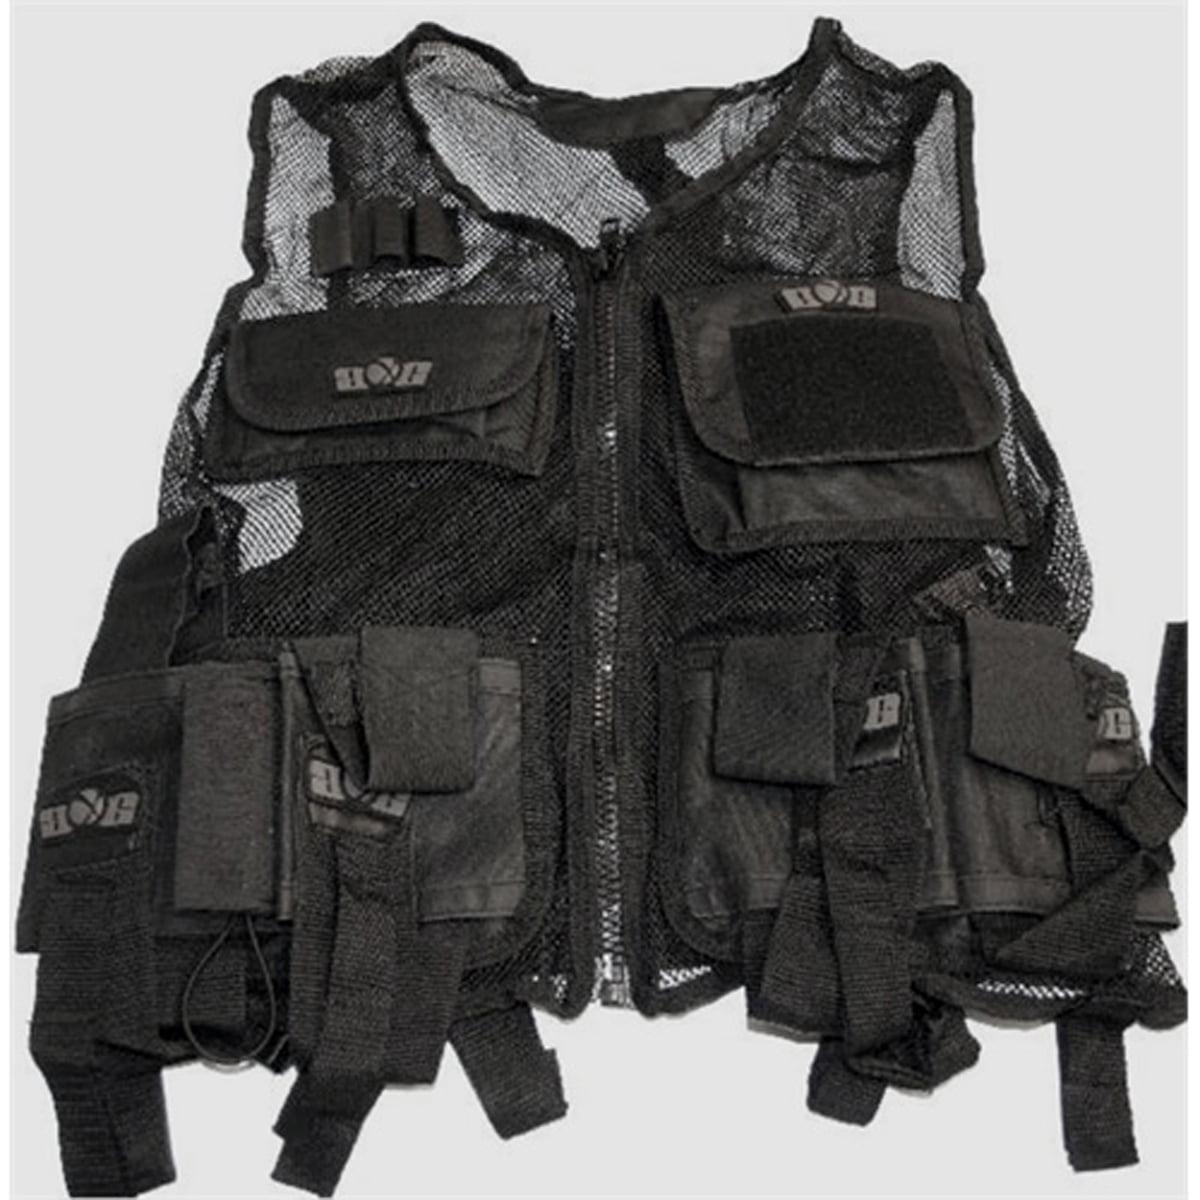 GXG Paintball Lightweight Tactical Vest - Black